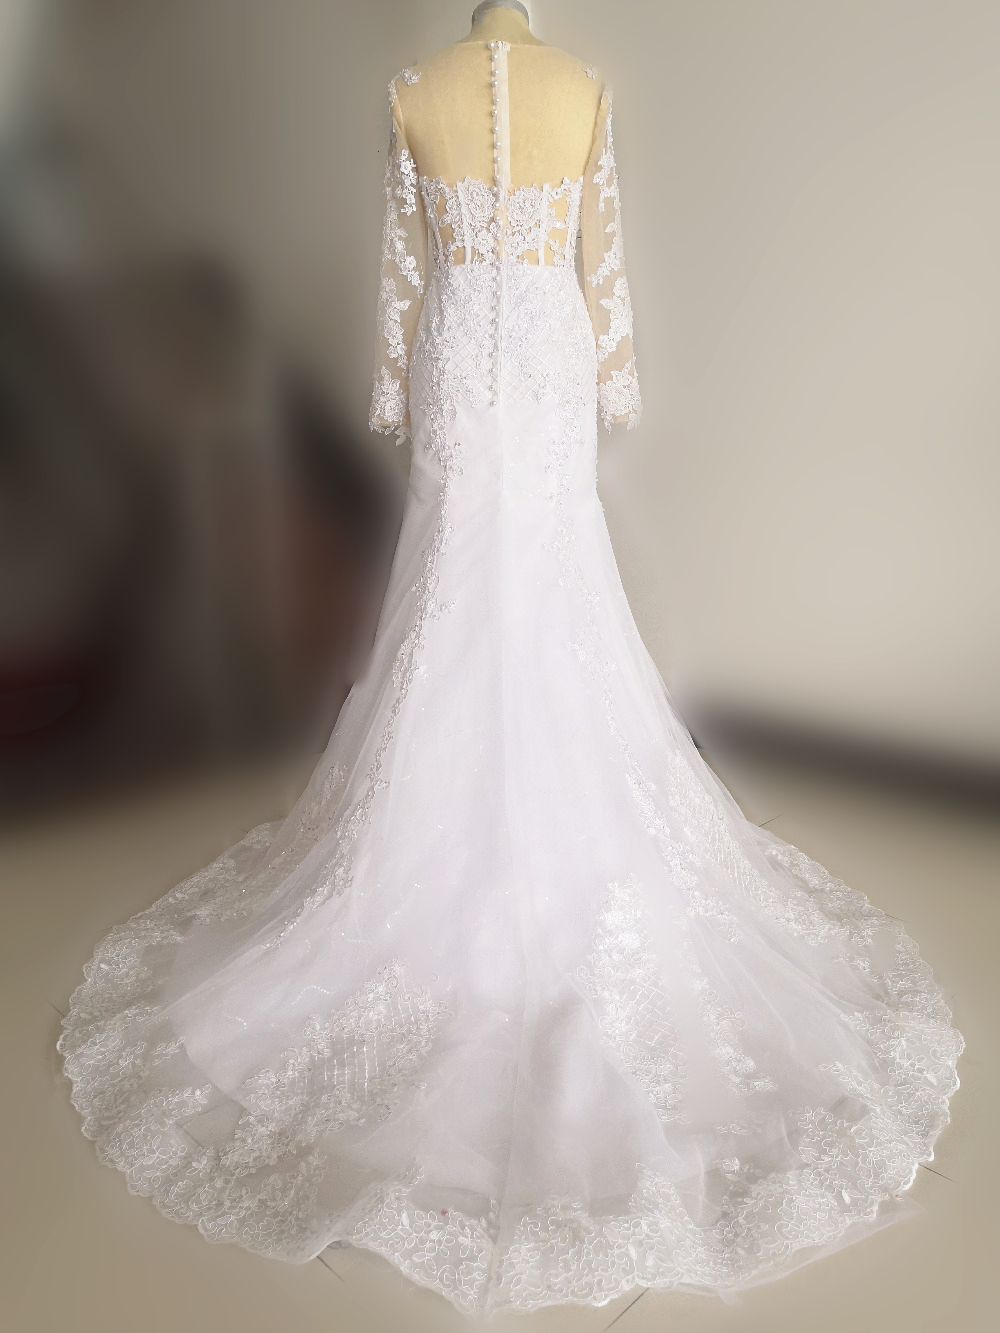 Sparkly Lace Wedding Dress Mermaid Illusion 6